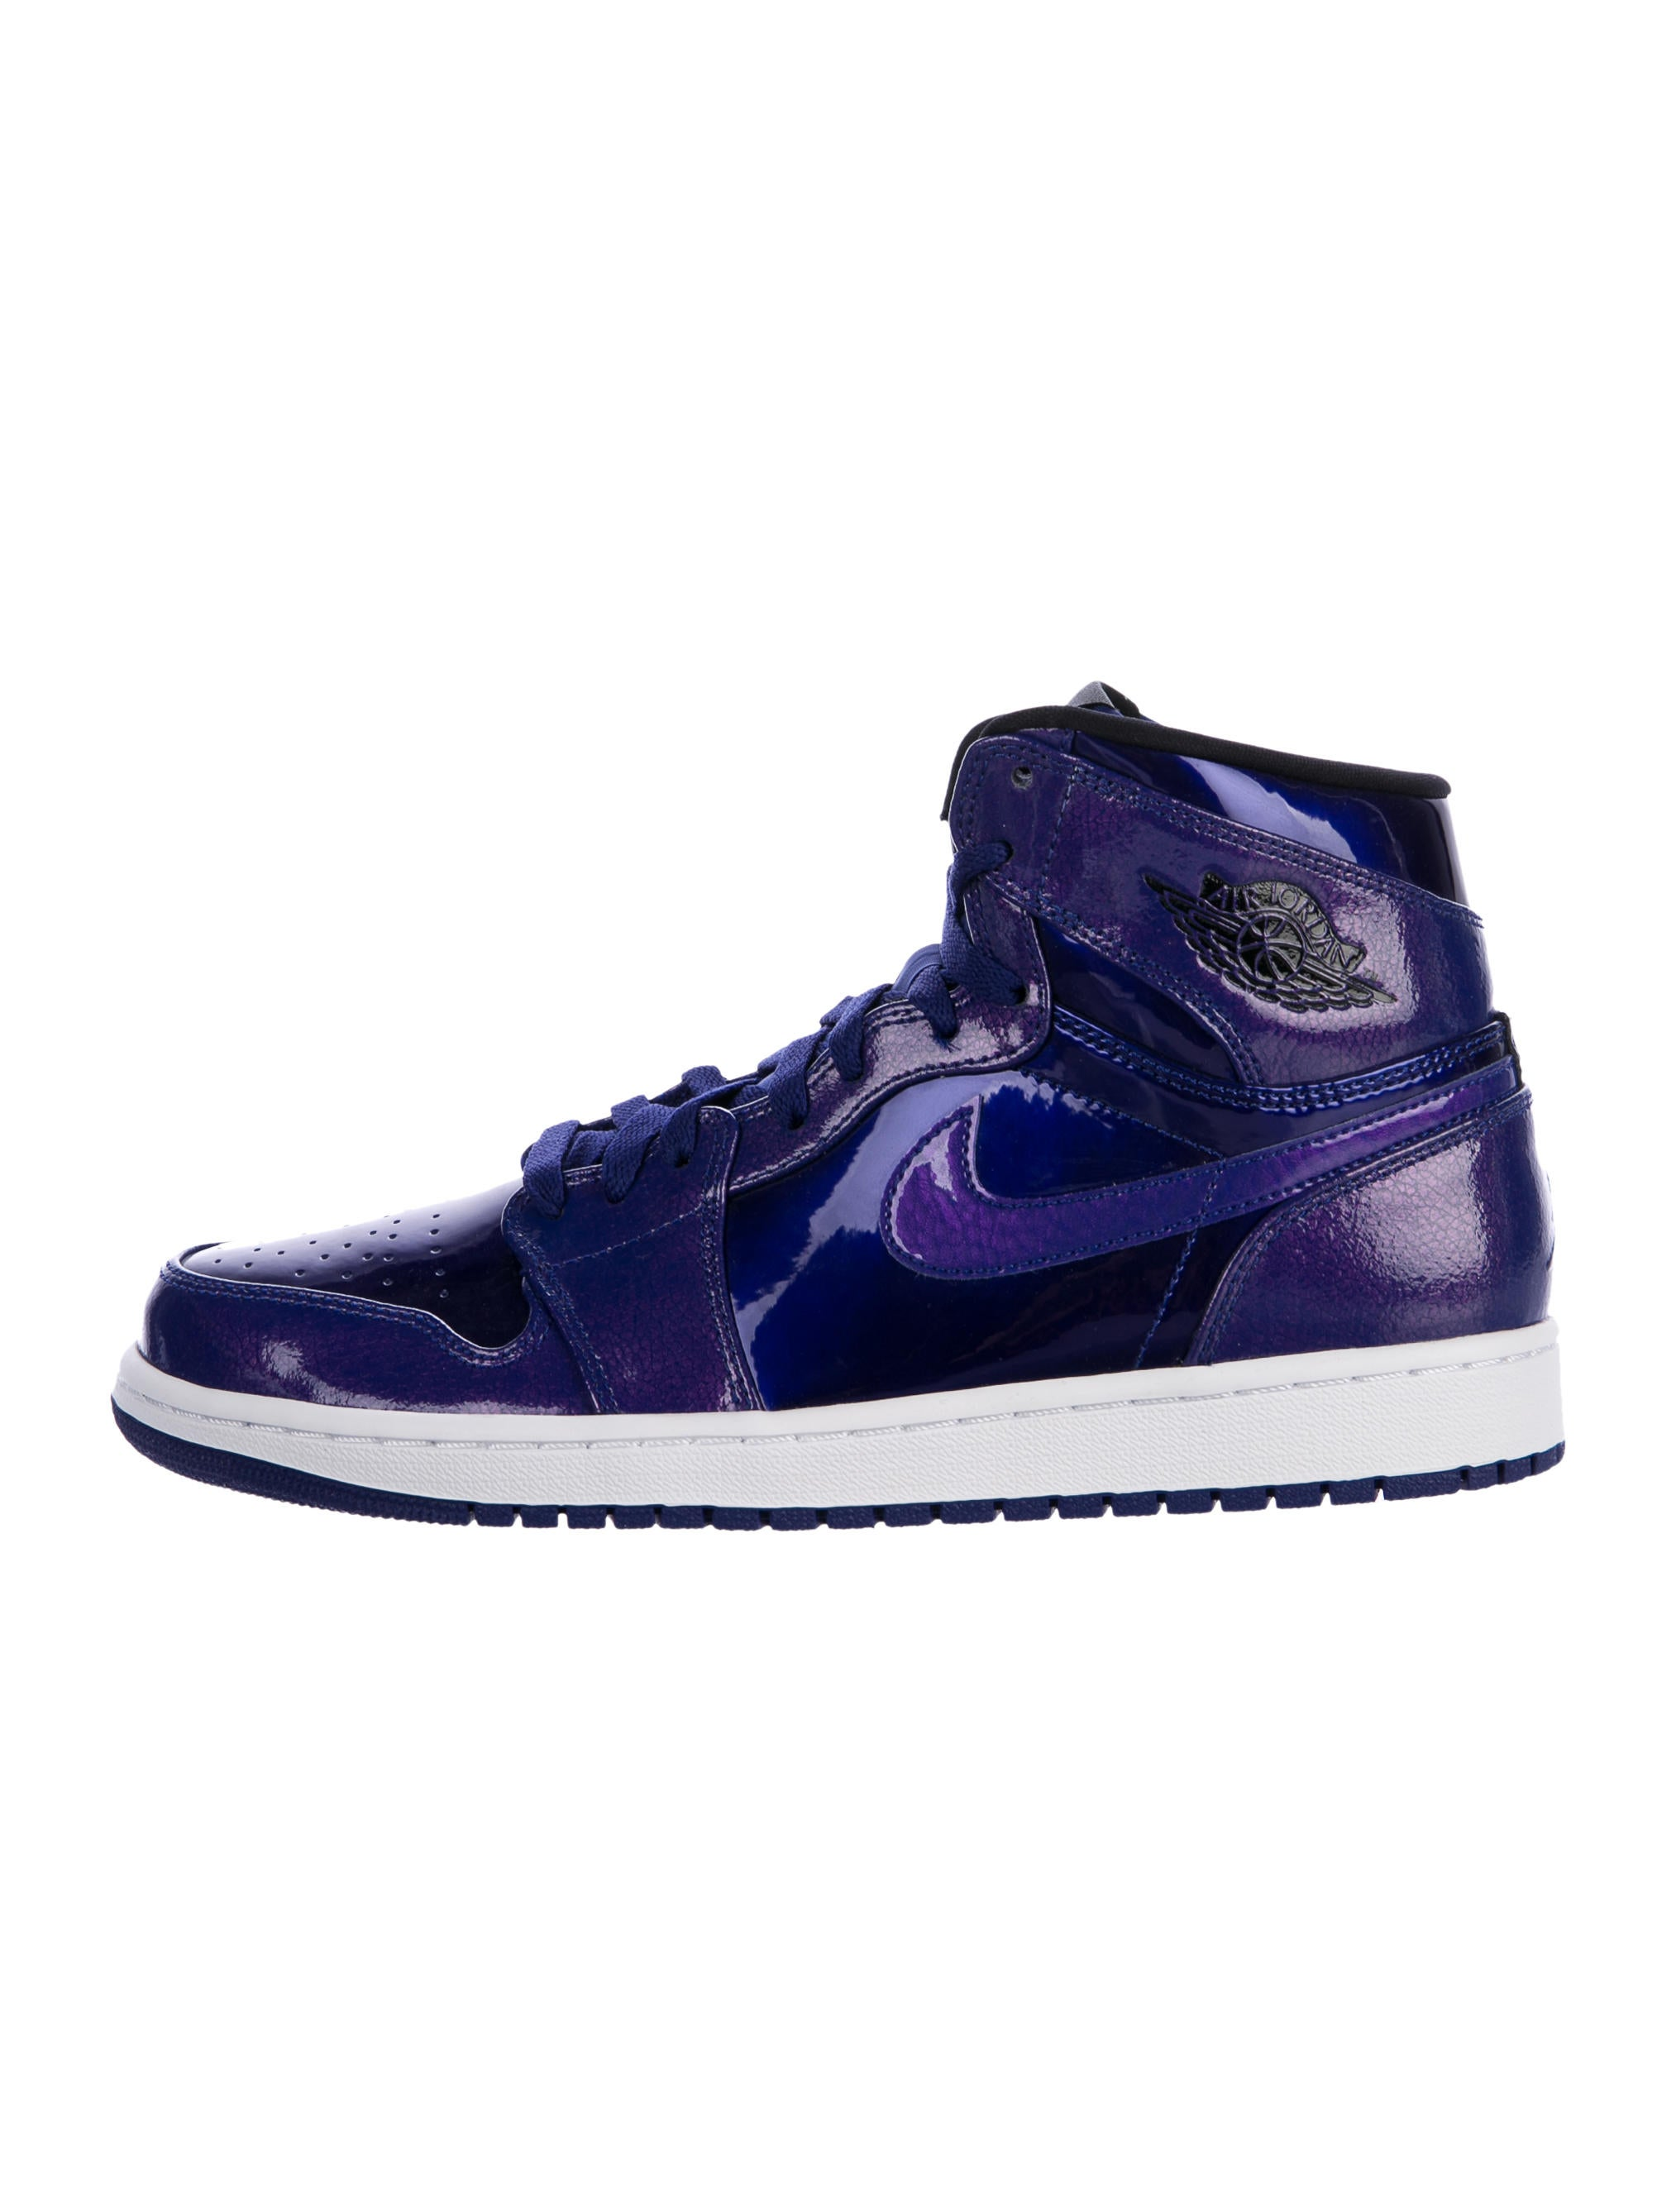 Nike Air Jordan 2016 1 Retro Patent Leather Sneakers W Tags Shoes Wniaj20521 The Realreal